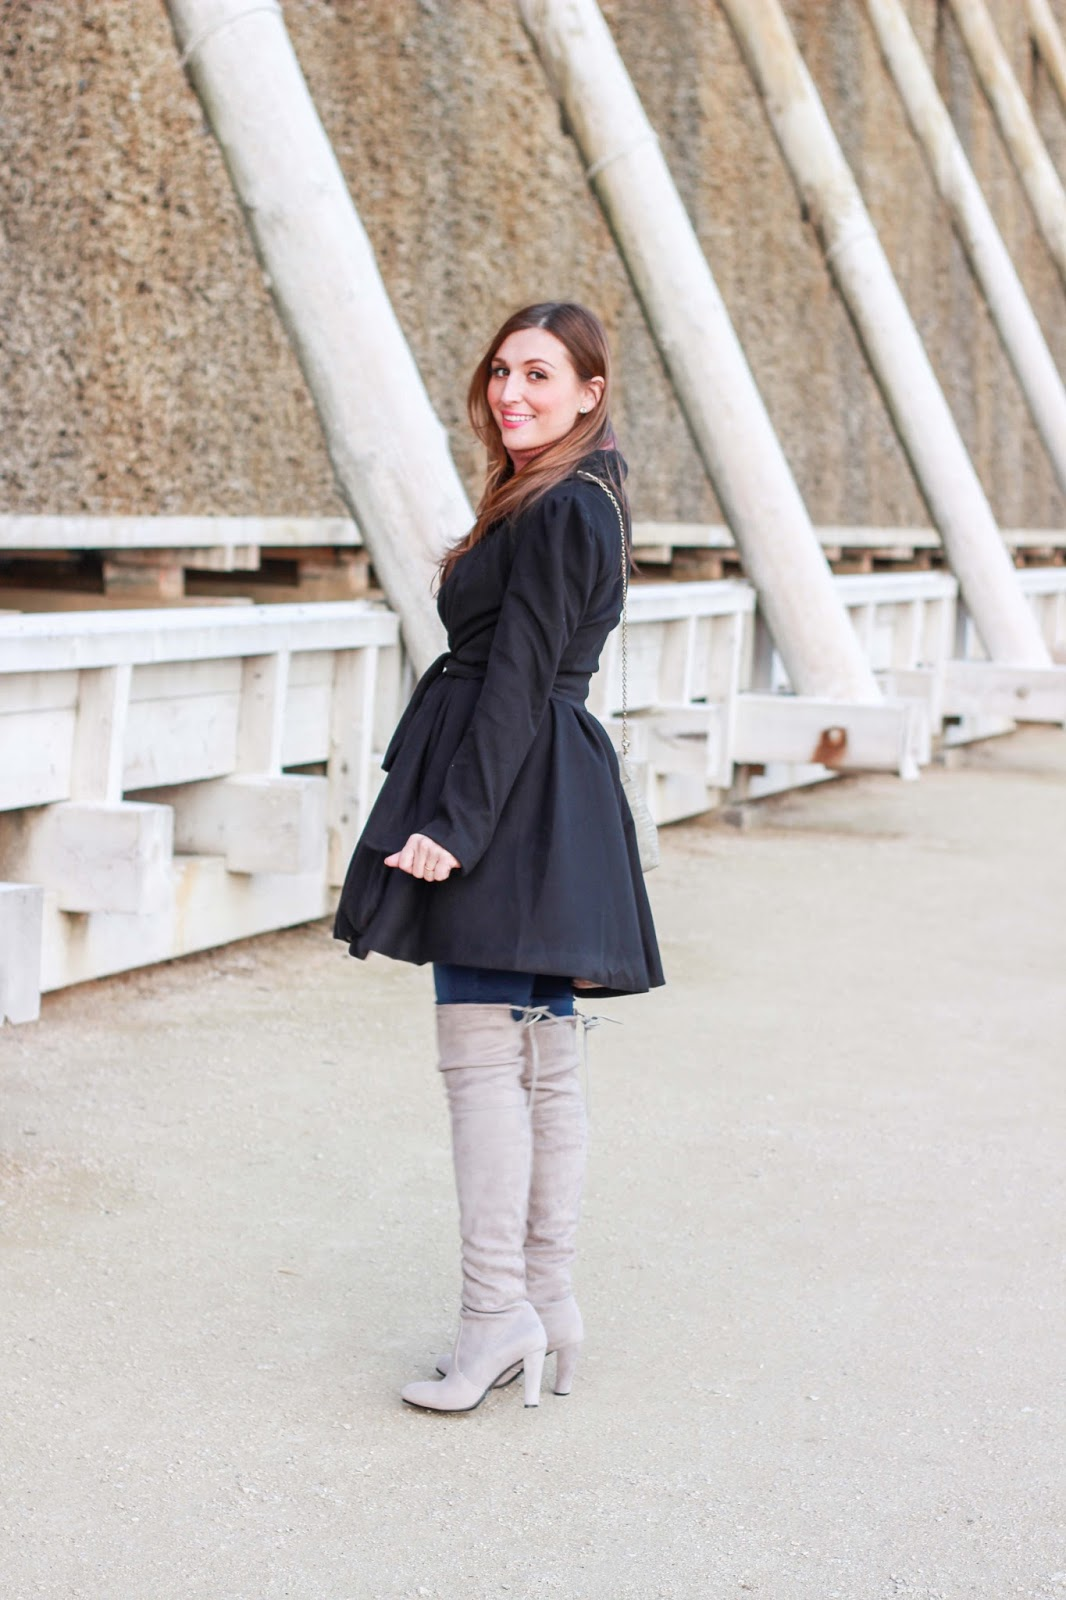 Schwarzer Mantel - Übergangsjacke Fashionblogger - Fashionblogger in Übergangsjacke - Fashionblog - Fashionstylebyjohanna - Kleid Fashionblogger